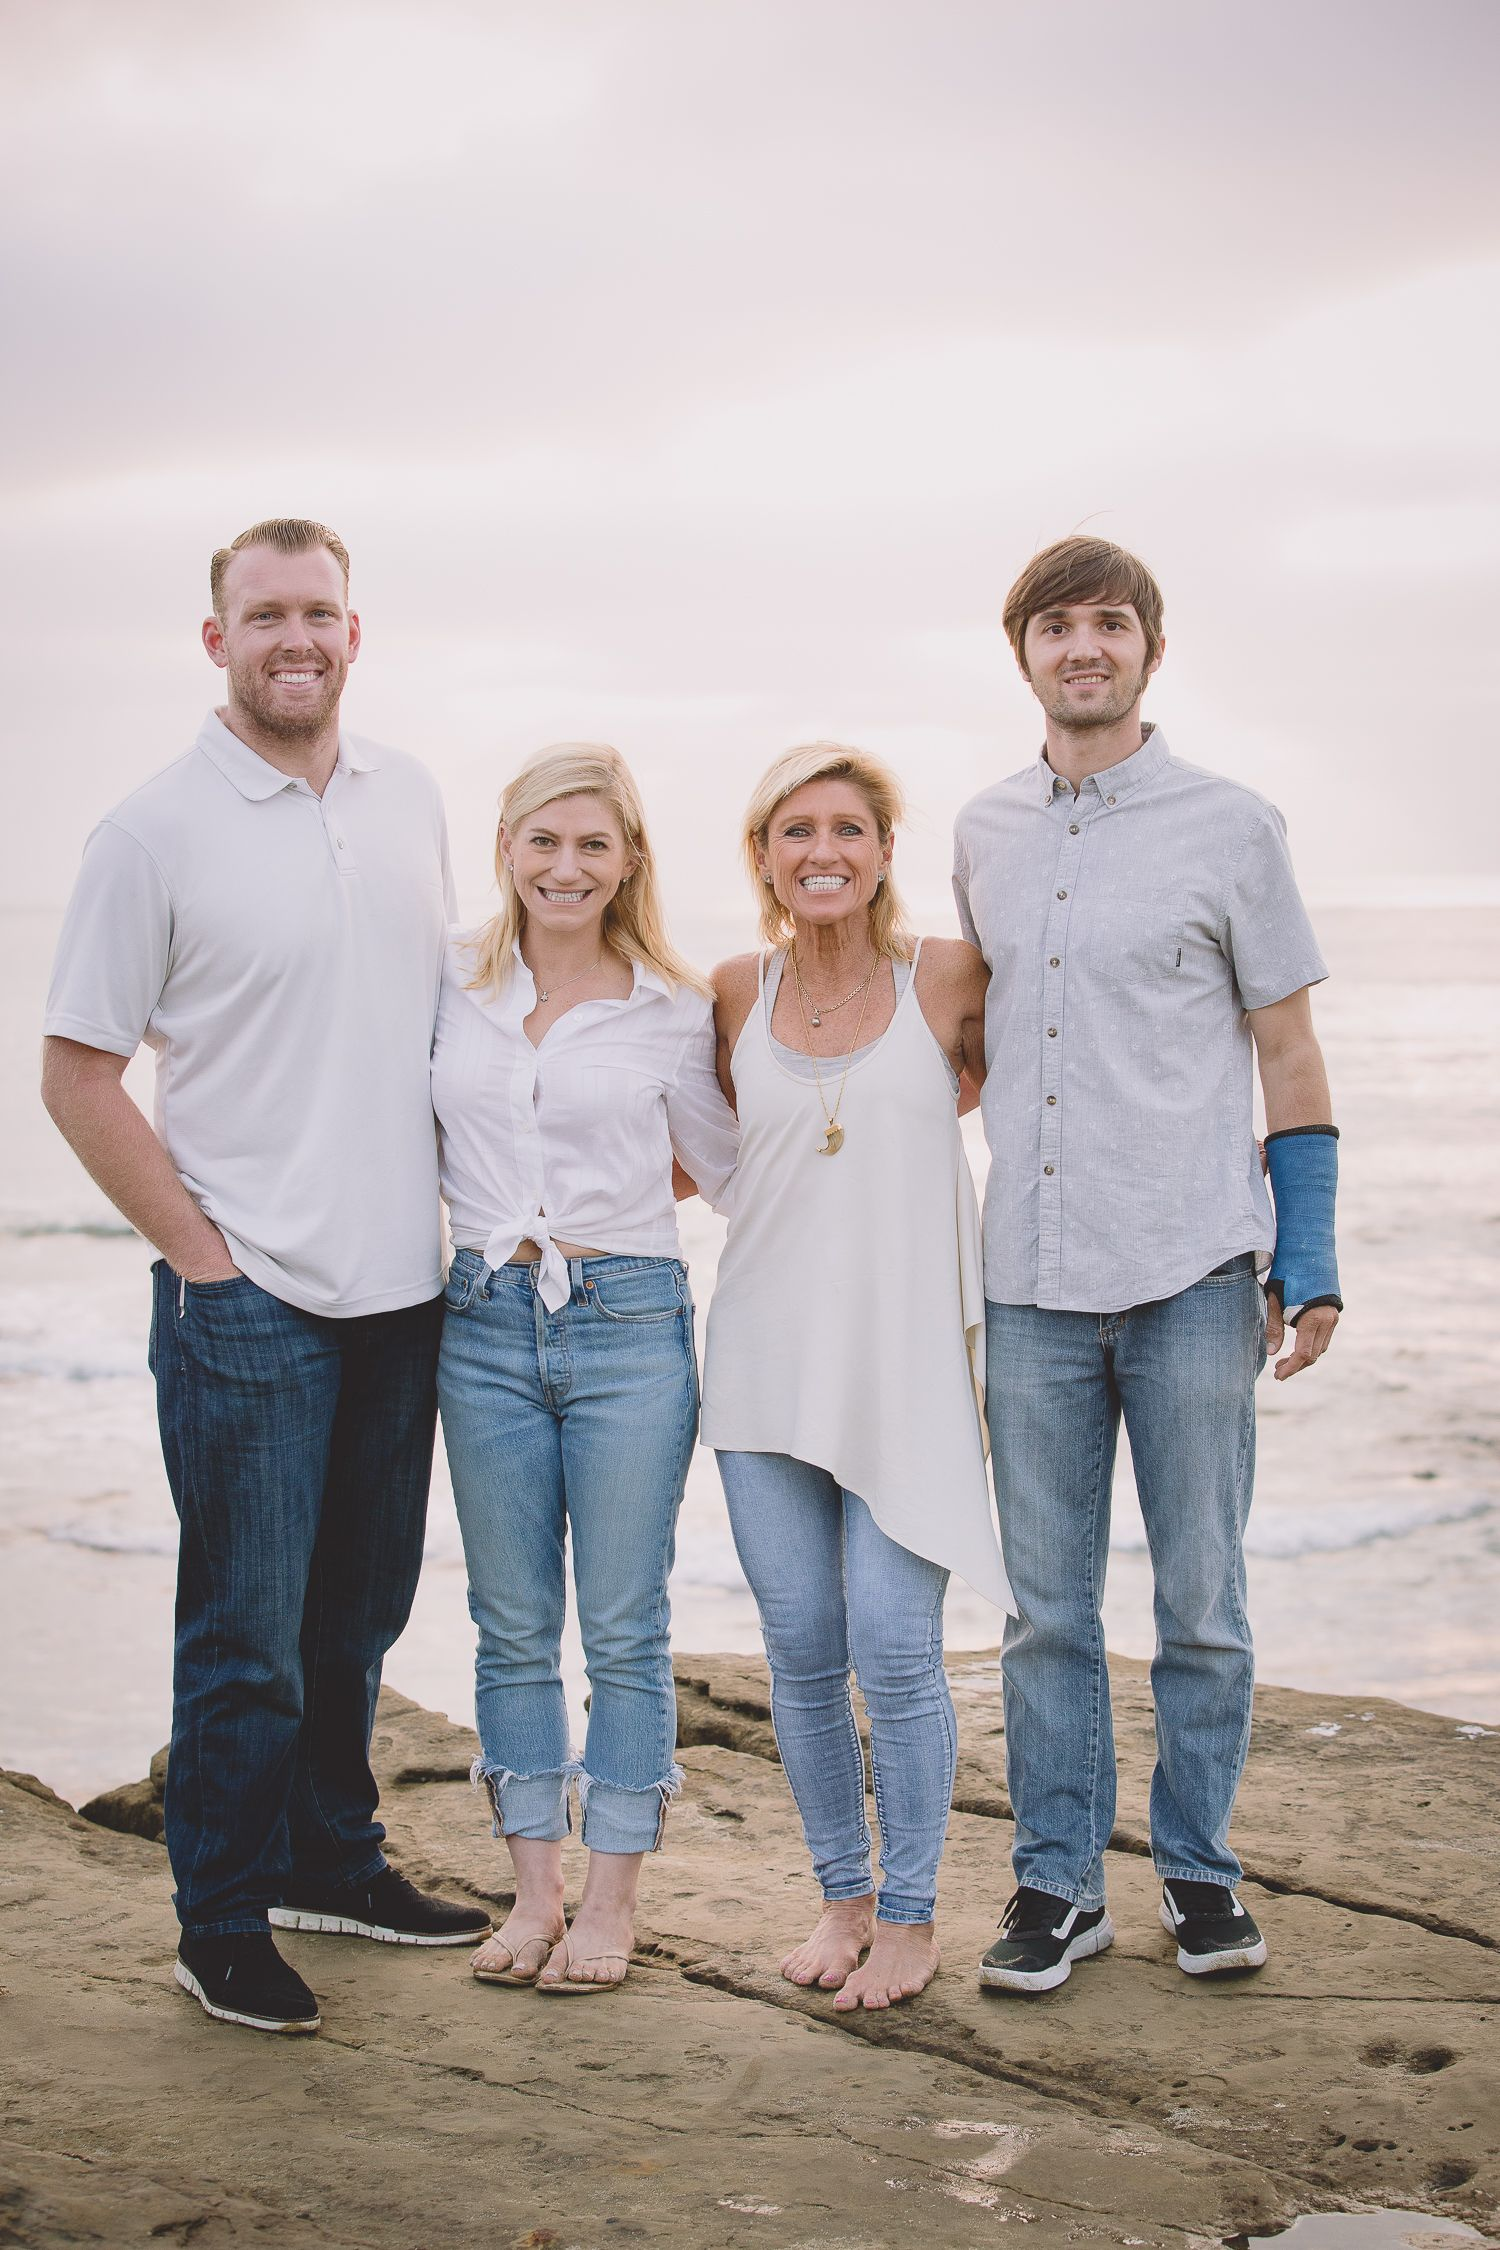 Fun beach family portrait session! #familyphotos #familyportraits #beachfamilyphotos #beach #sandiegobeach #sandiegobeachfamilyphotographer #familyphotographer #familyphotoideas #familyfun #beachfamilyphotoideas #beachlife #familygoals #melissamontoyaphotography